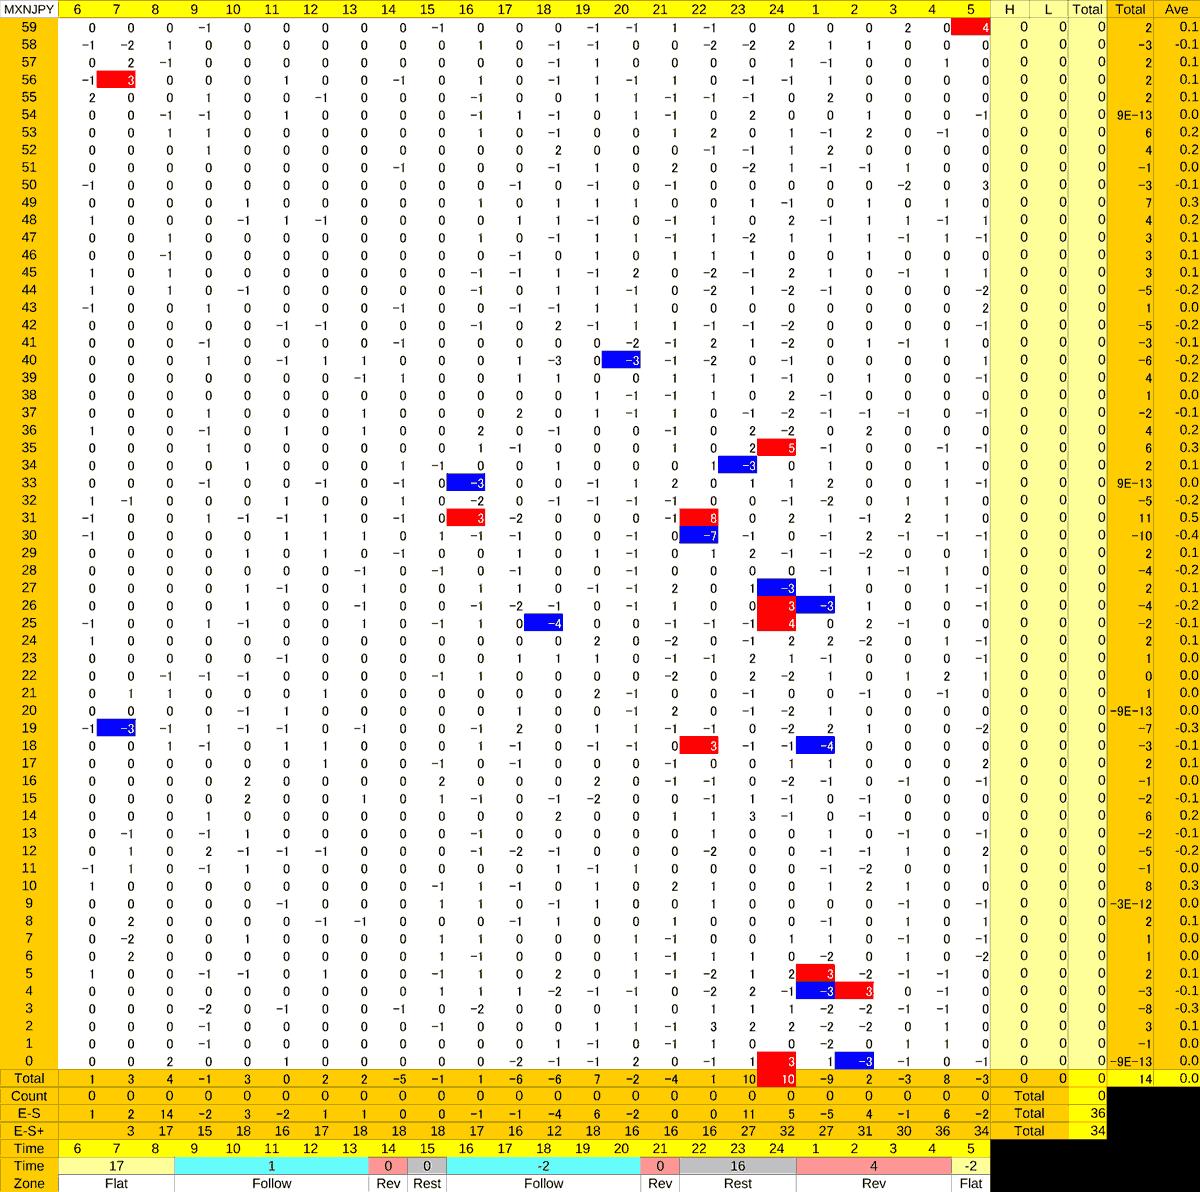 20210210_HS(3)MXNJPY